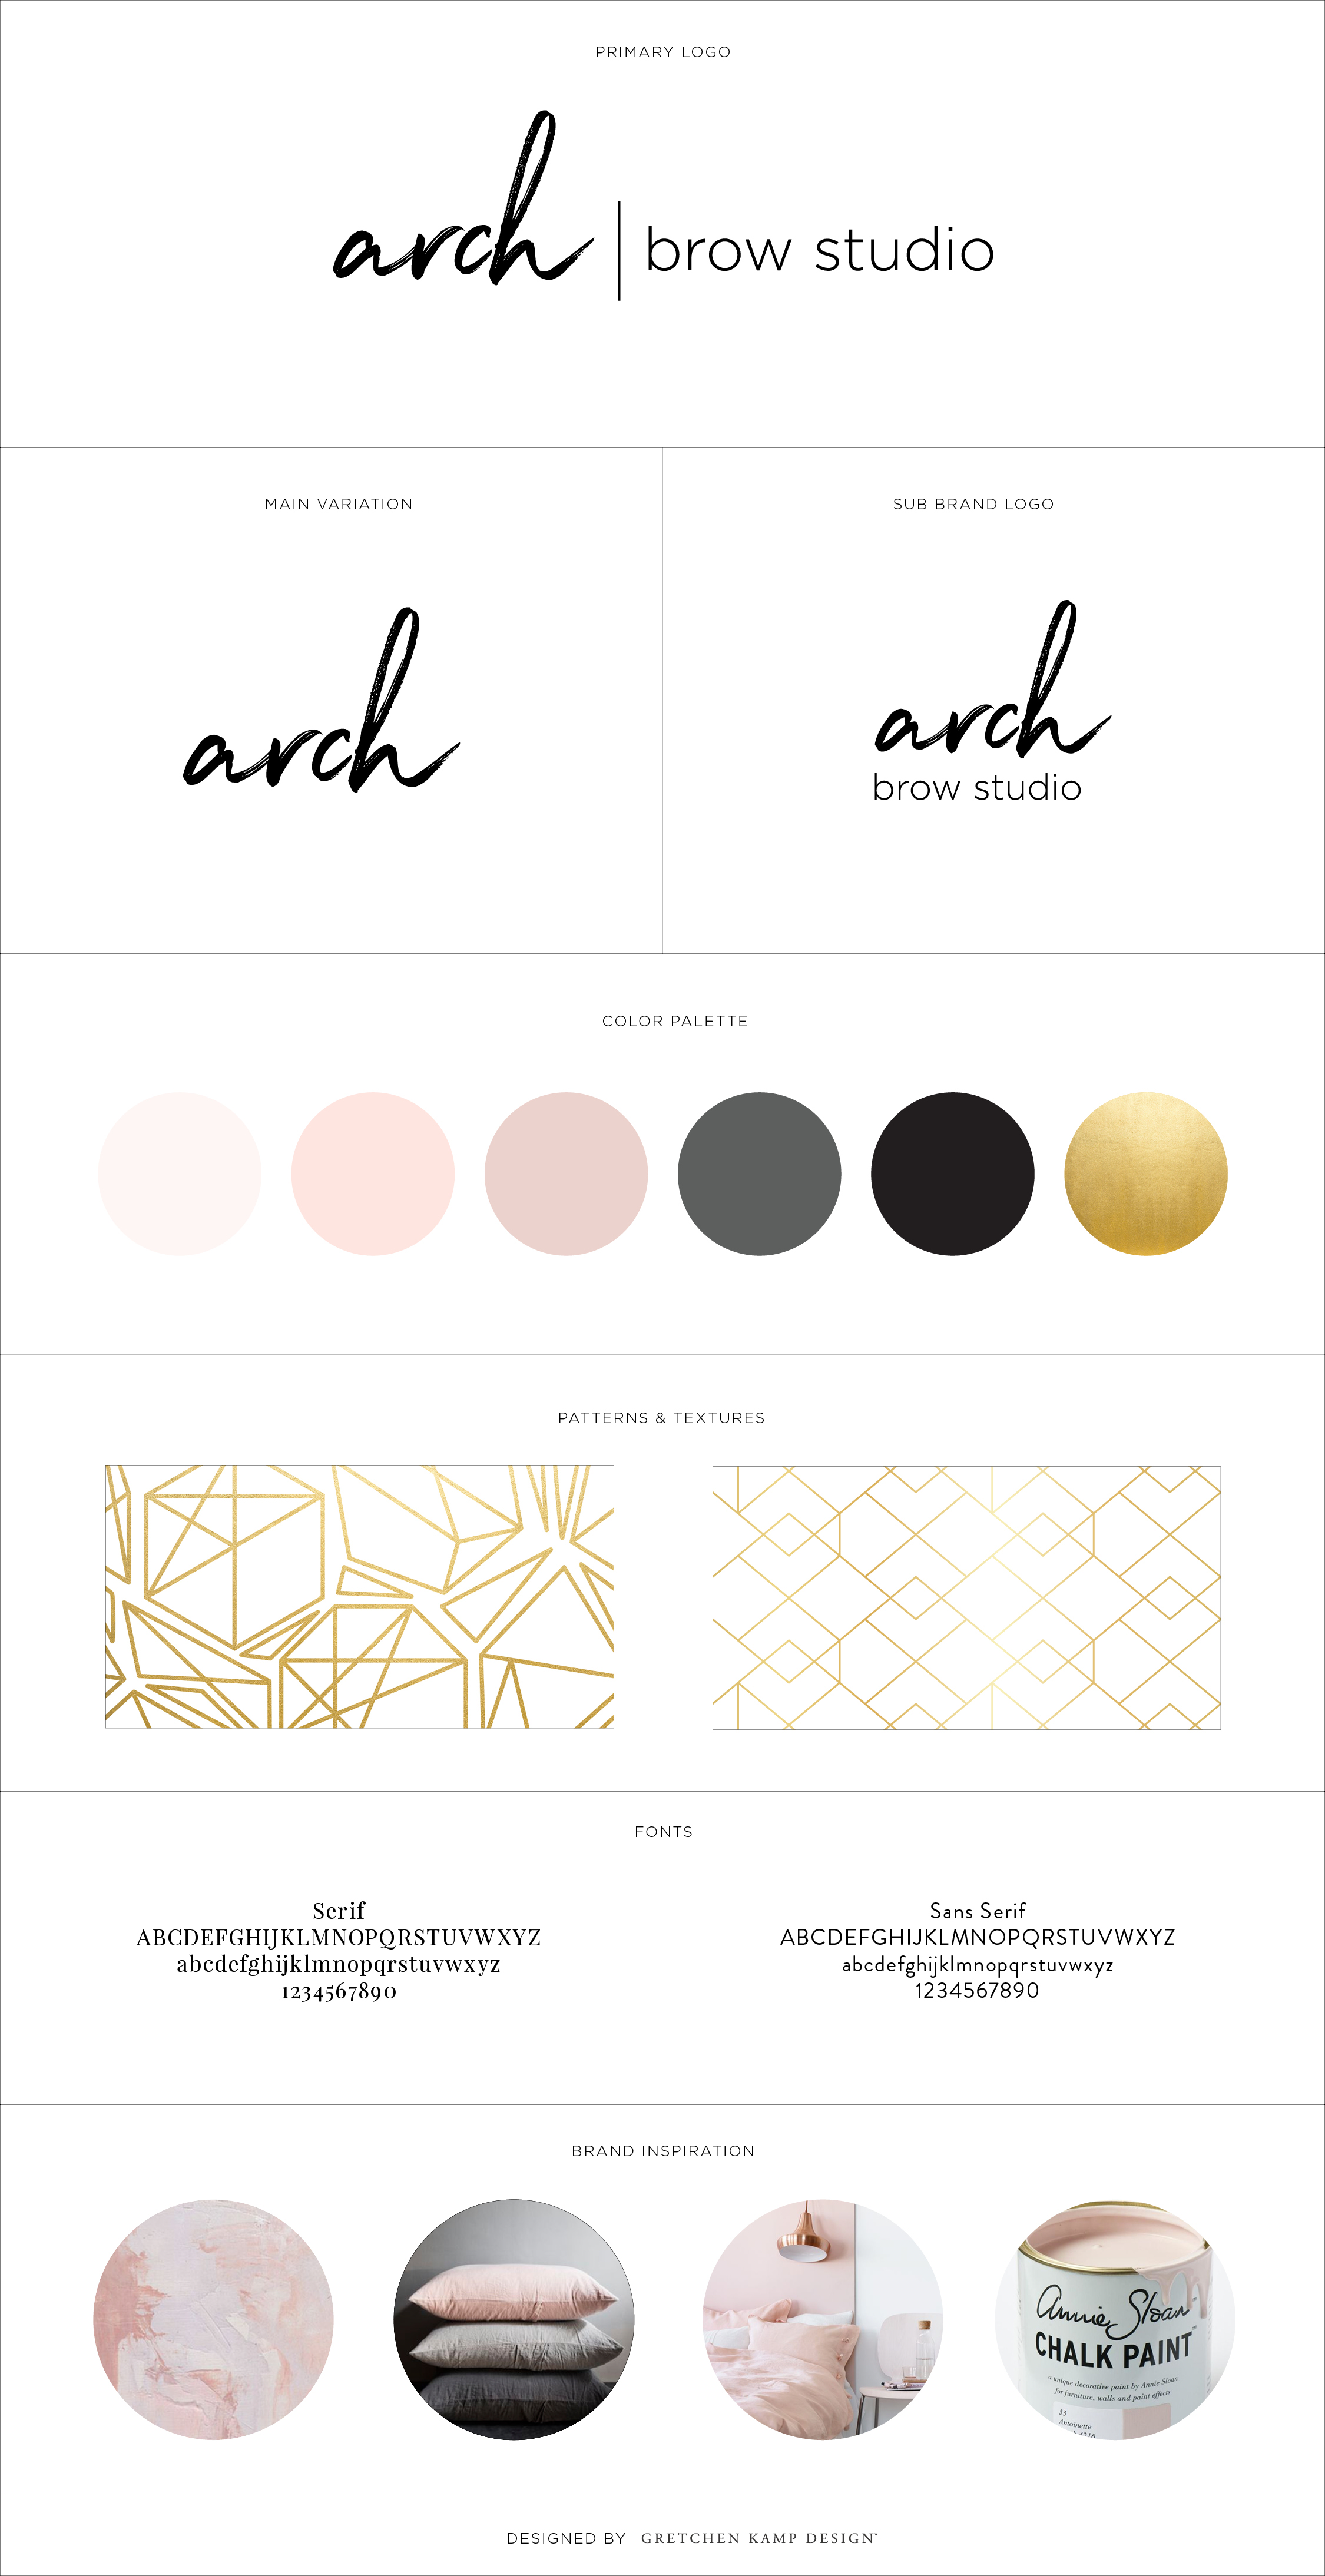 archbrowstudio_brand.jpg